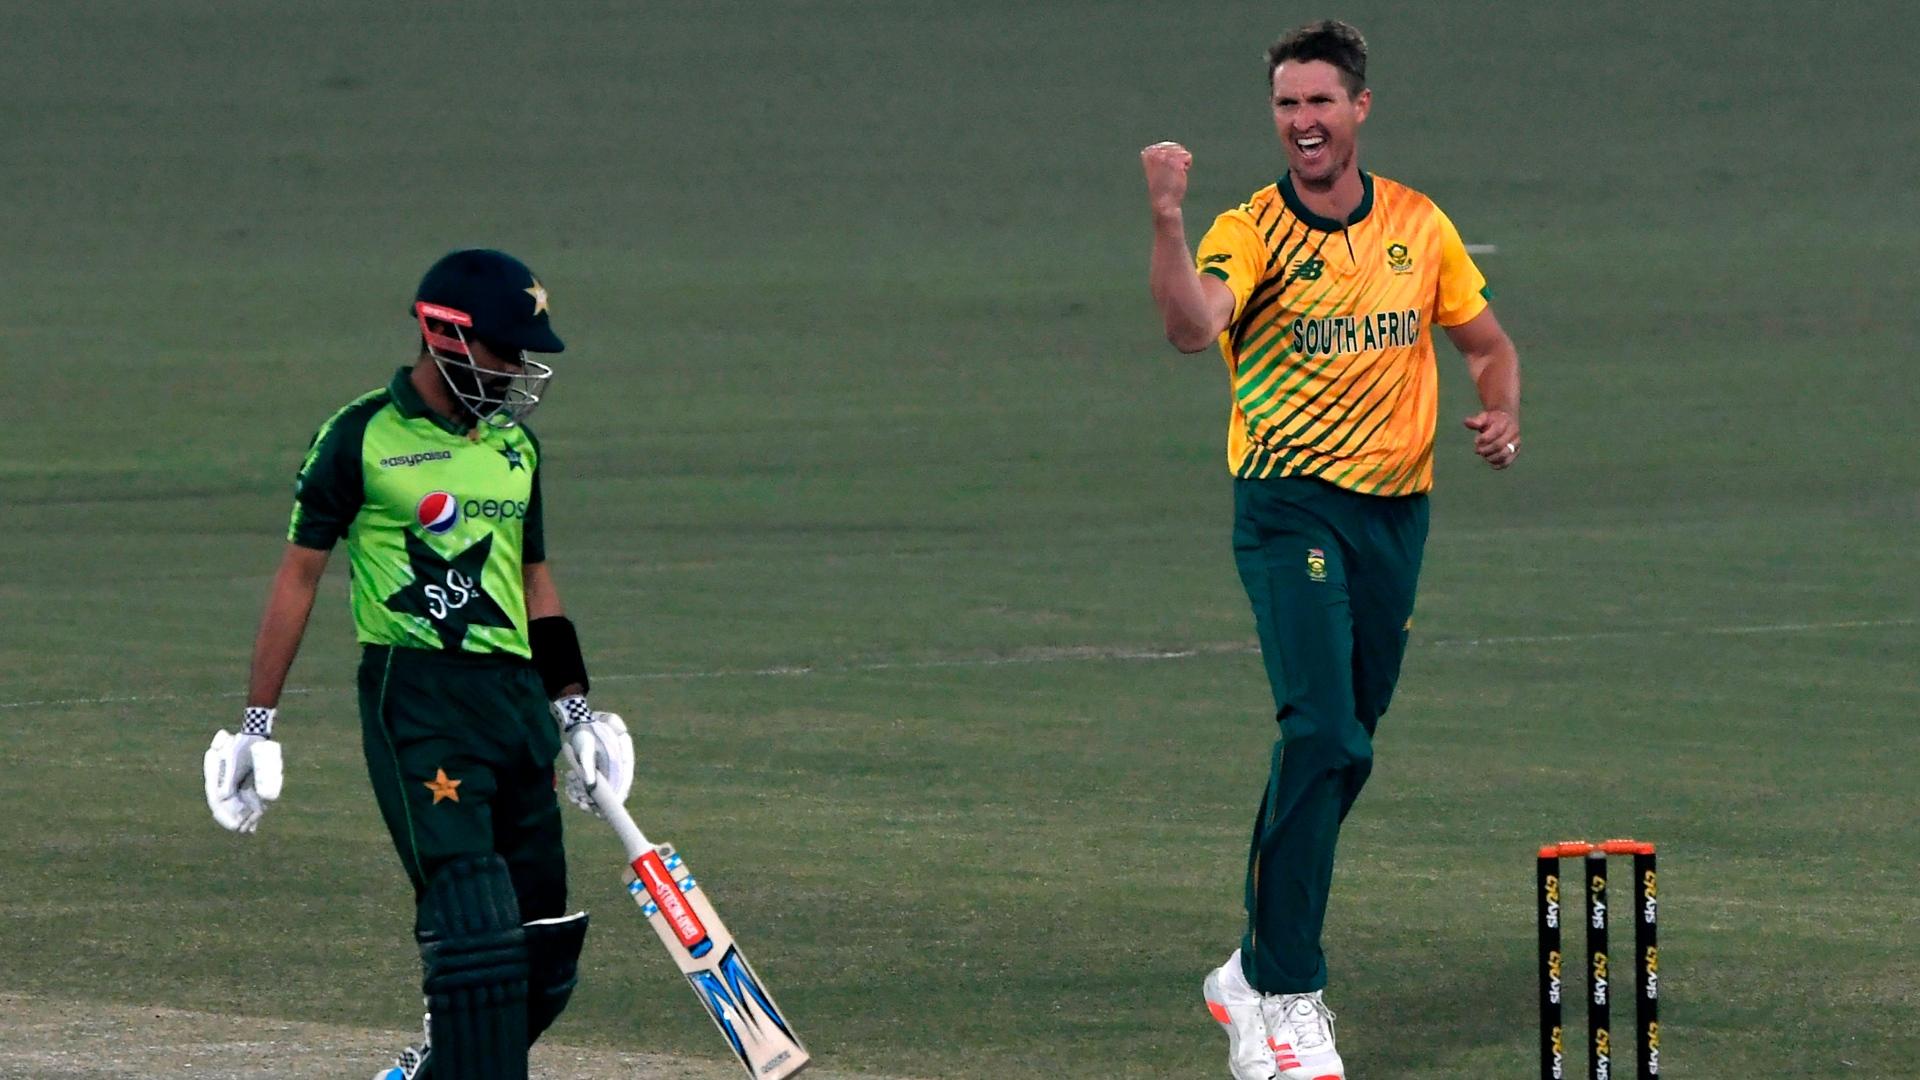 Pretorius shines as South Africa level series against Pakistan